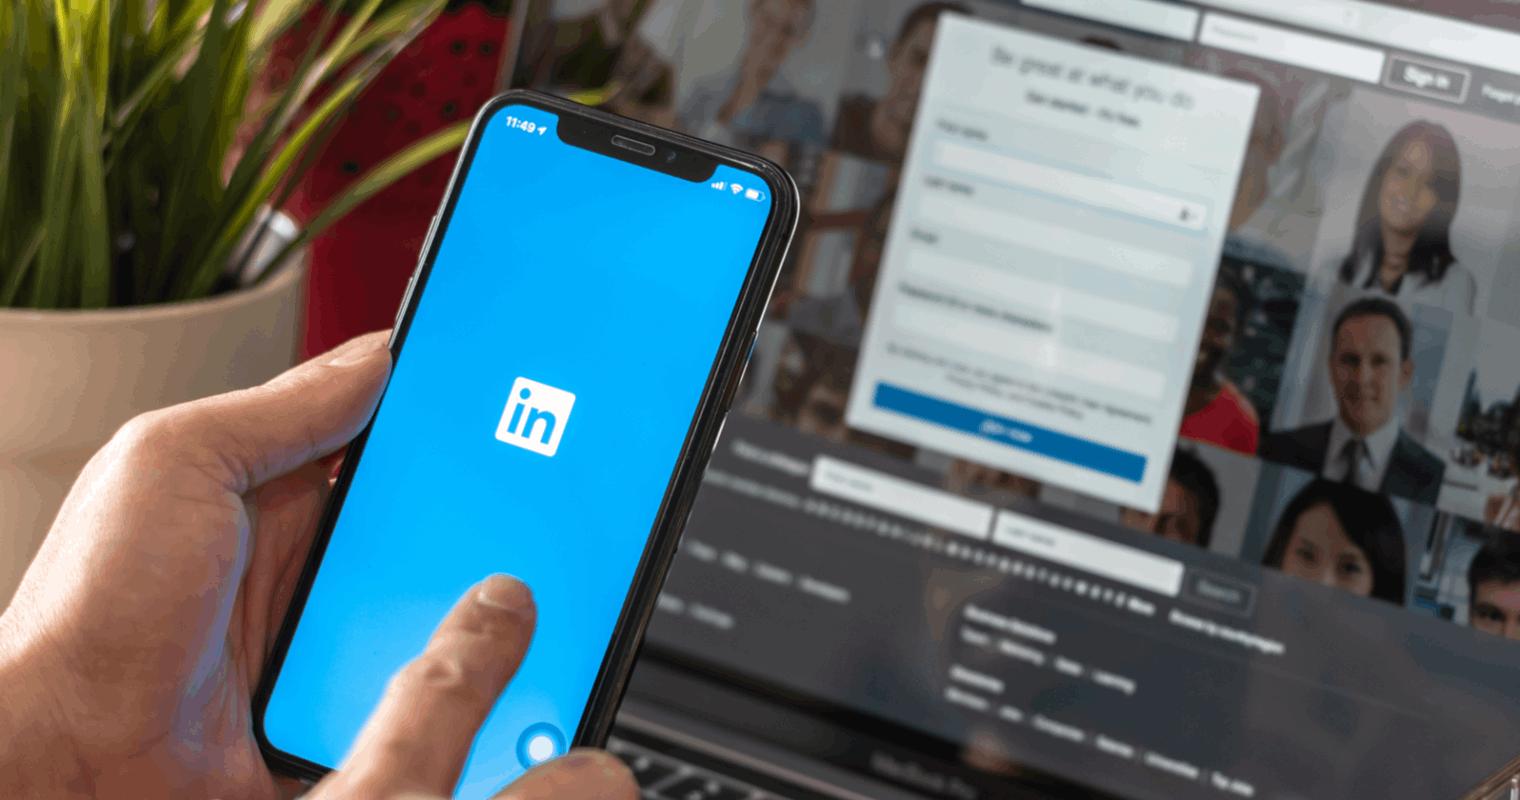 LinkedIn Job Hunting Tips To Keep In Mind - See Here